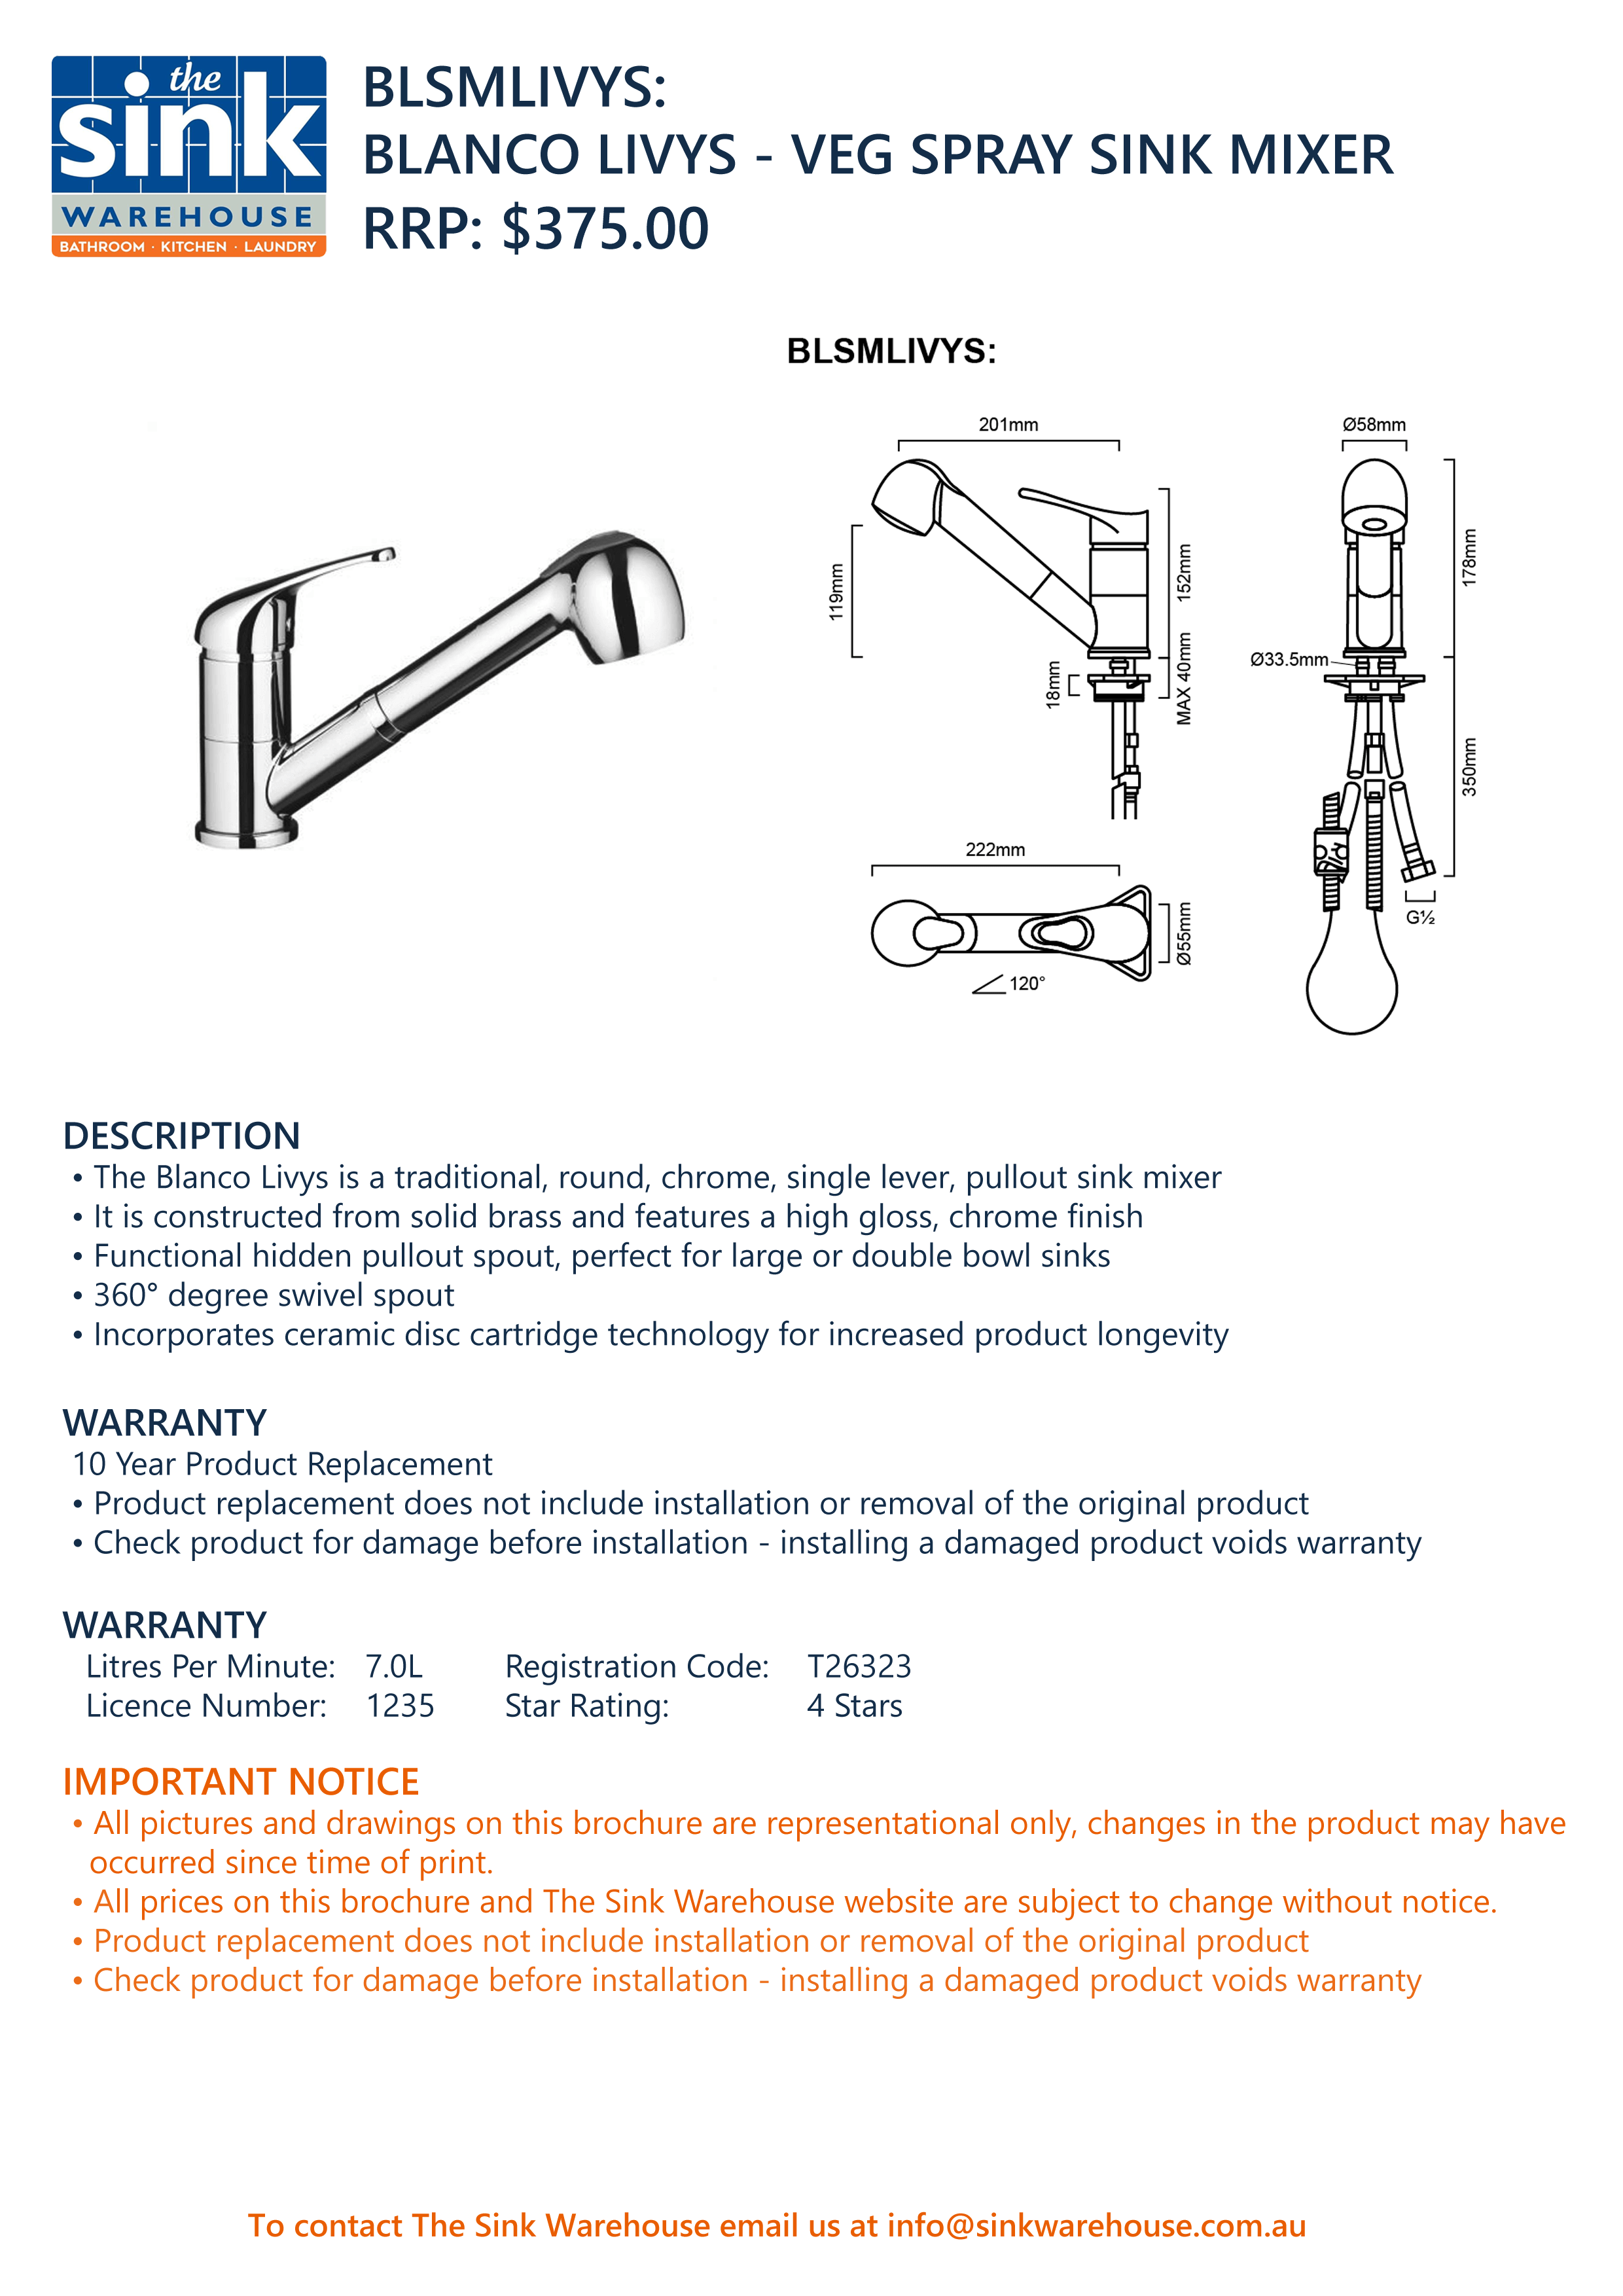 blsmlivys-product-spec-sheet-updated-11-07-2019-.png